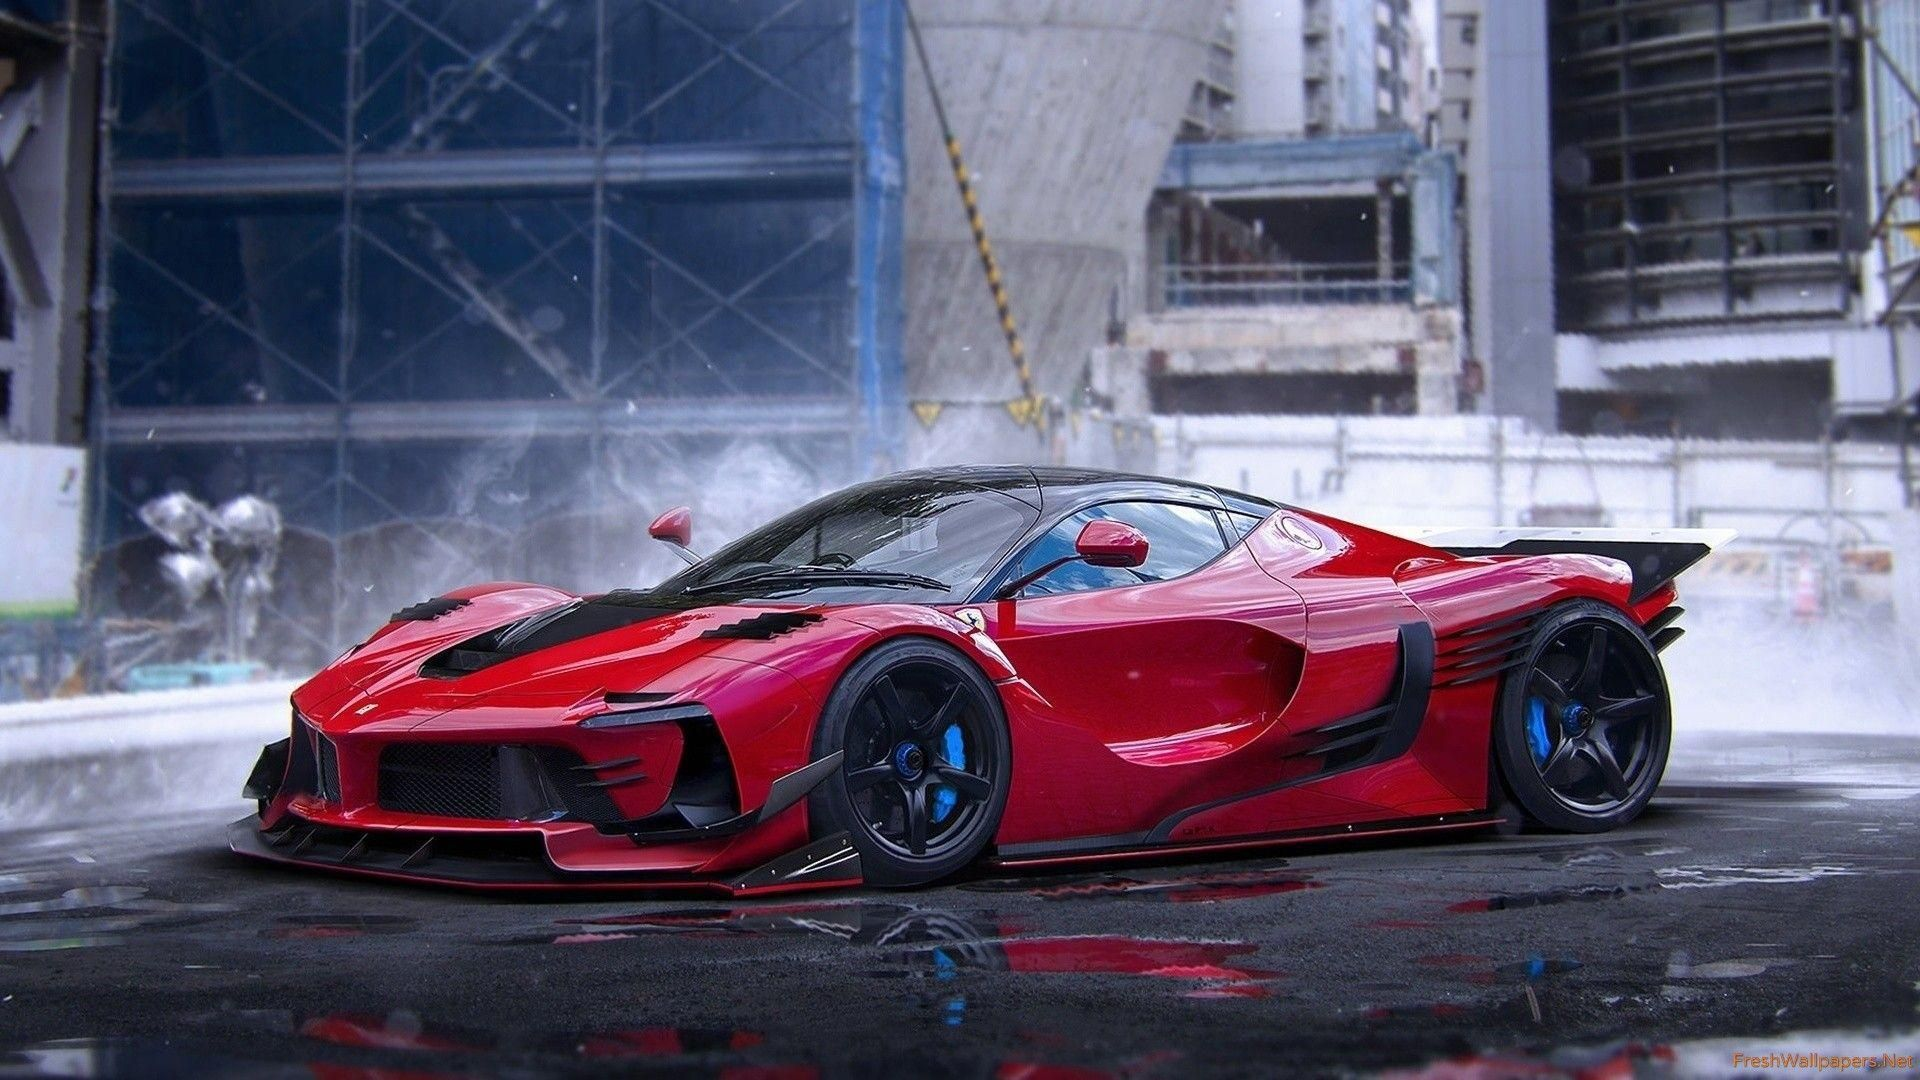 Resultado De Imagem Para Laferrari Wallpaper Red Sports Car Sports Car Ferrari Laferrari